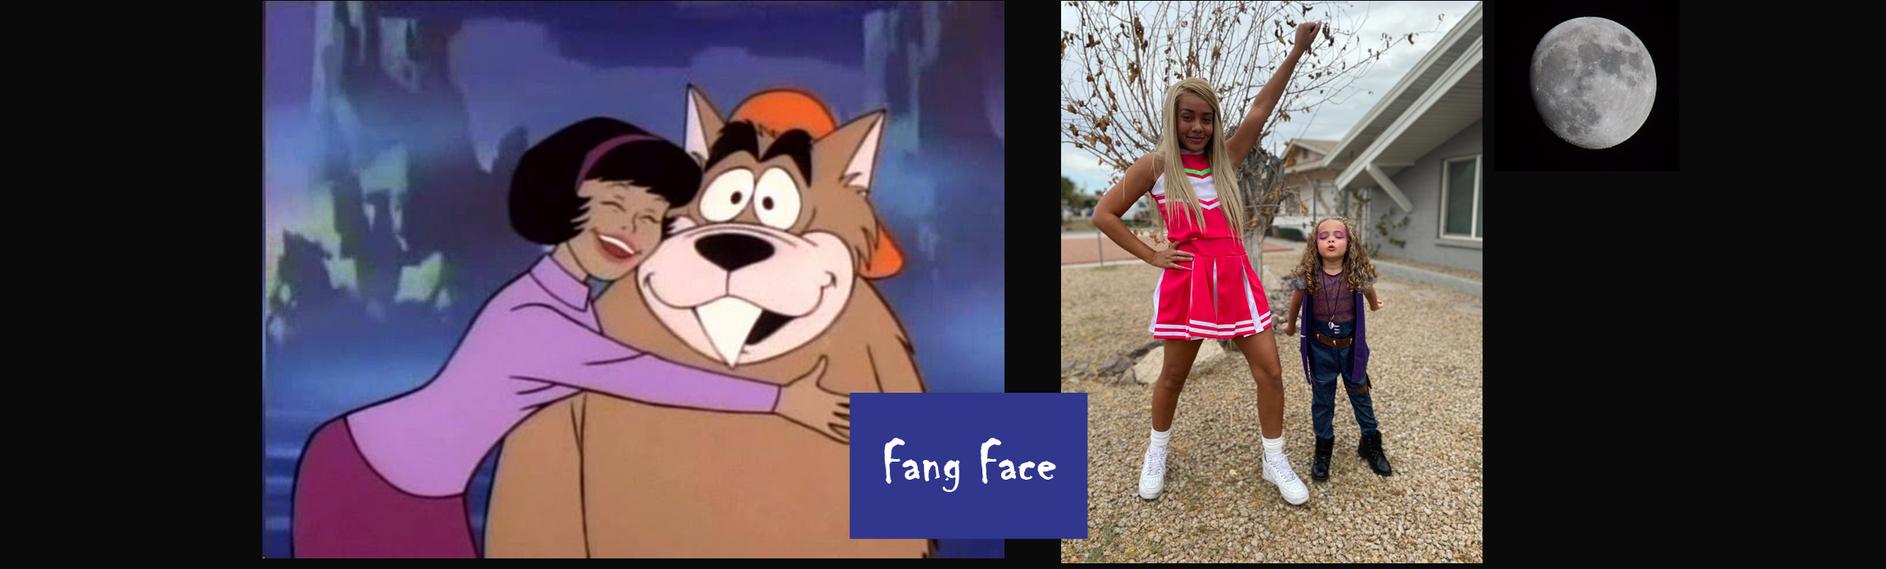 fang face 4.png